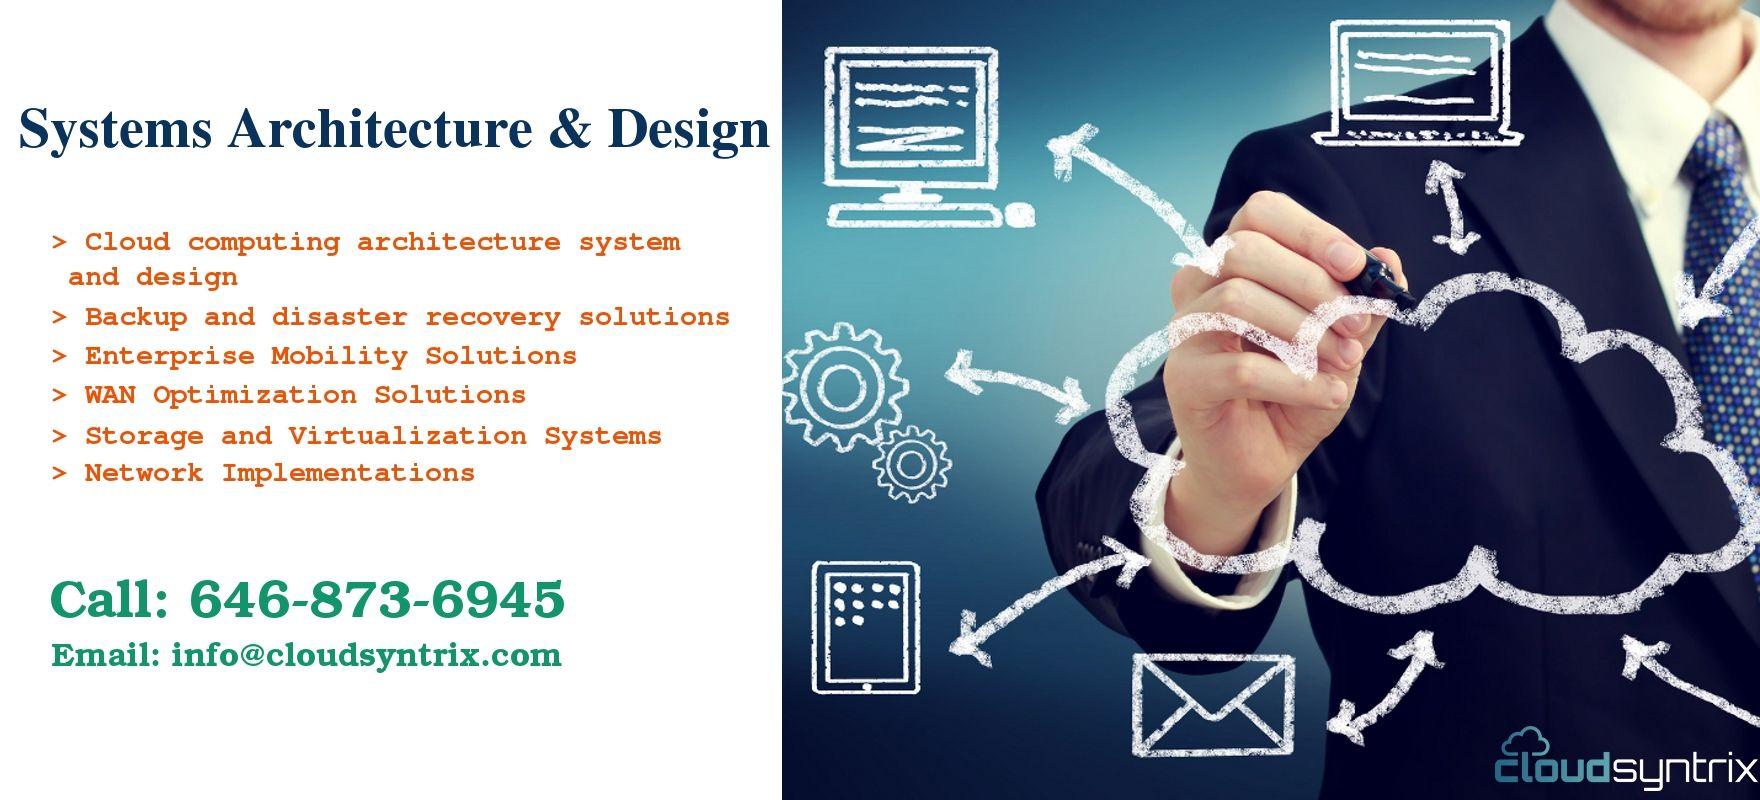 System Architecture Design Services Cloudsyntrix S It Information Technology Consul Management Information Systems Technology Consulting System Architecture